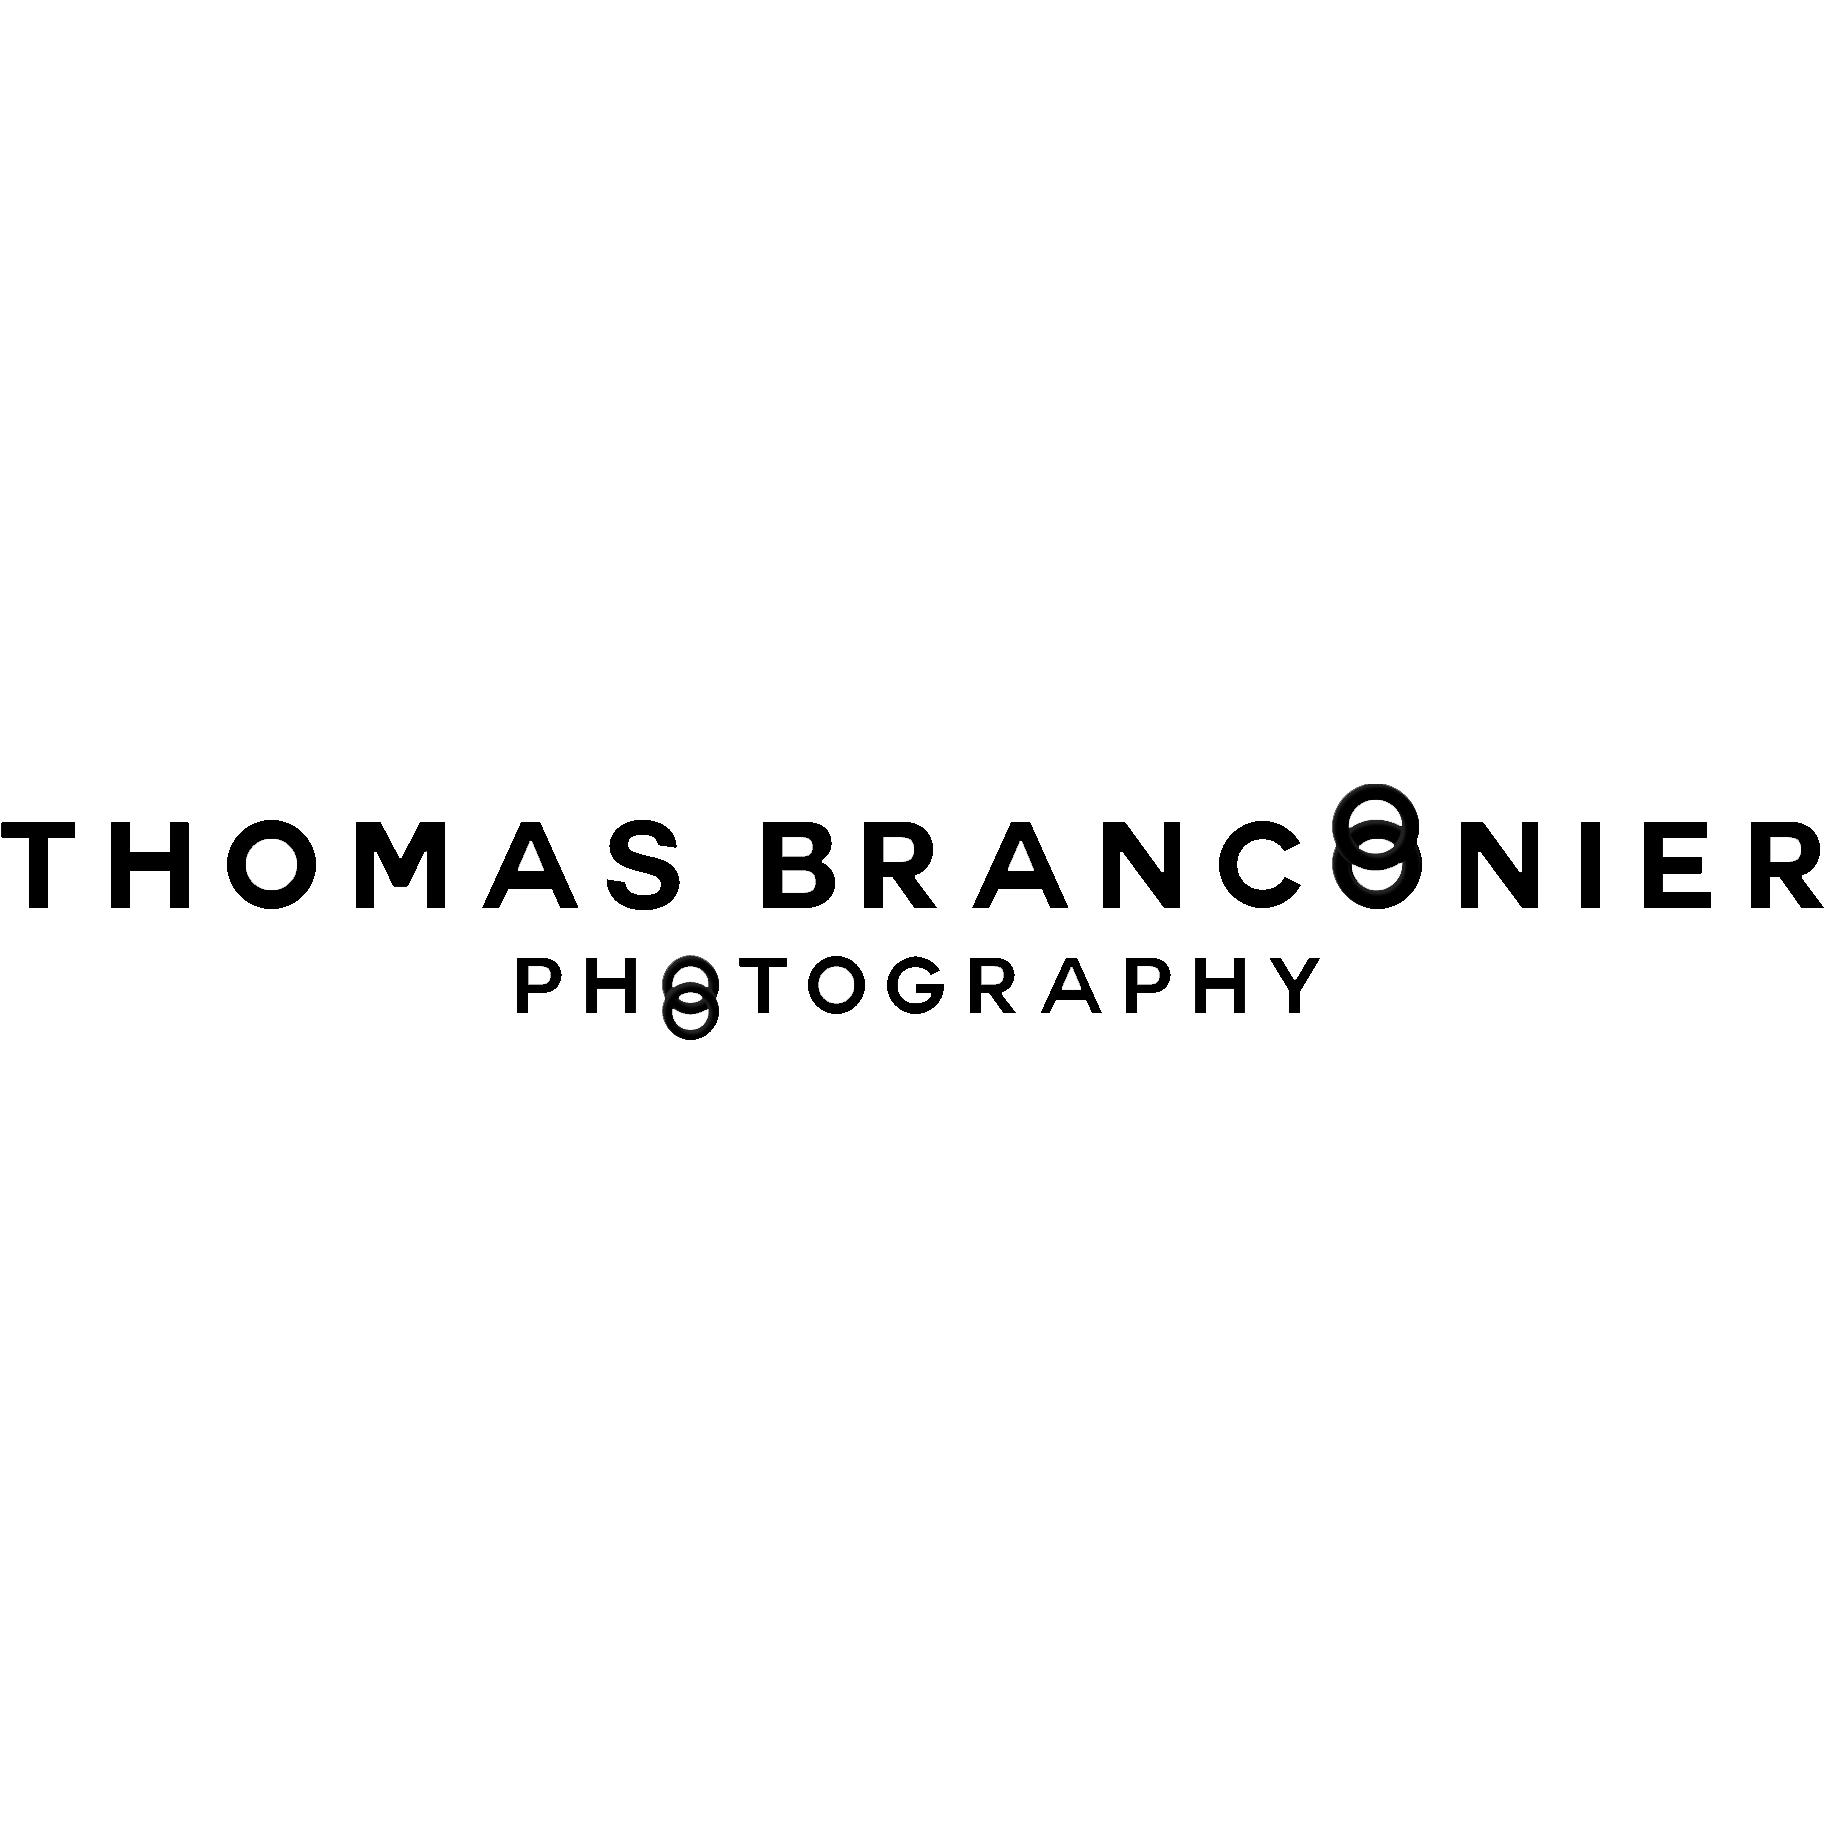 Tom Branconier